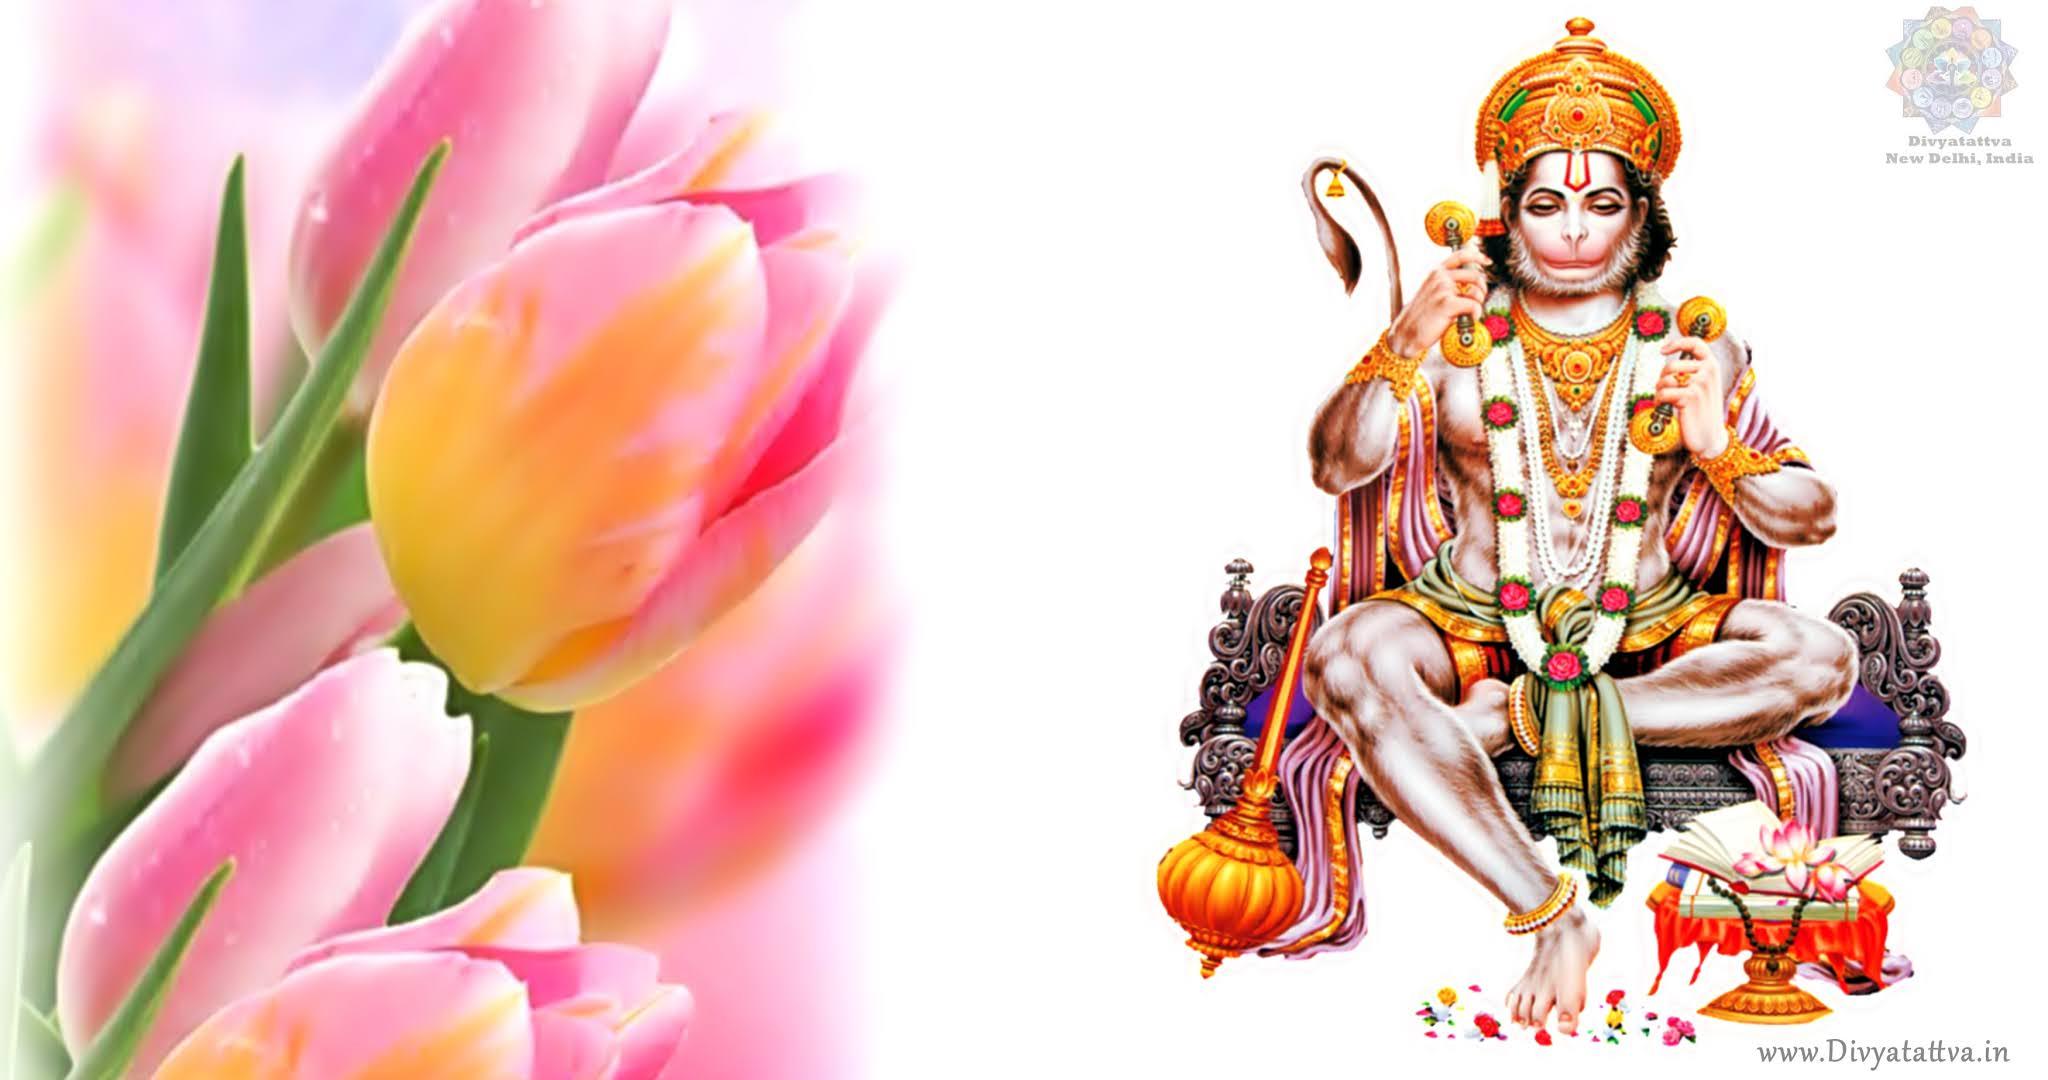 Hindu God Hanuman Wallpaper, Hanuman Jayanti Wallpapers, Lord Hanuman Pictures in 4K HD, Hindu God Hanuman Ji Stock Photos & Images